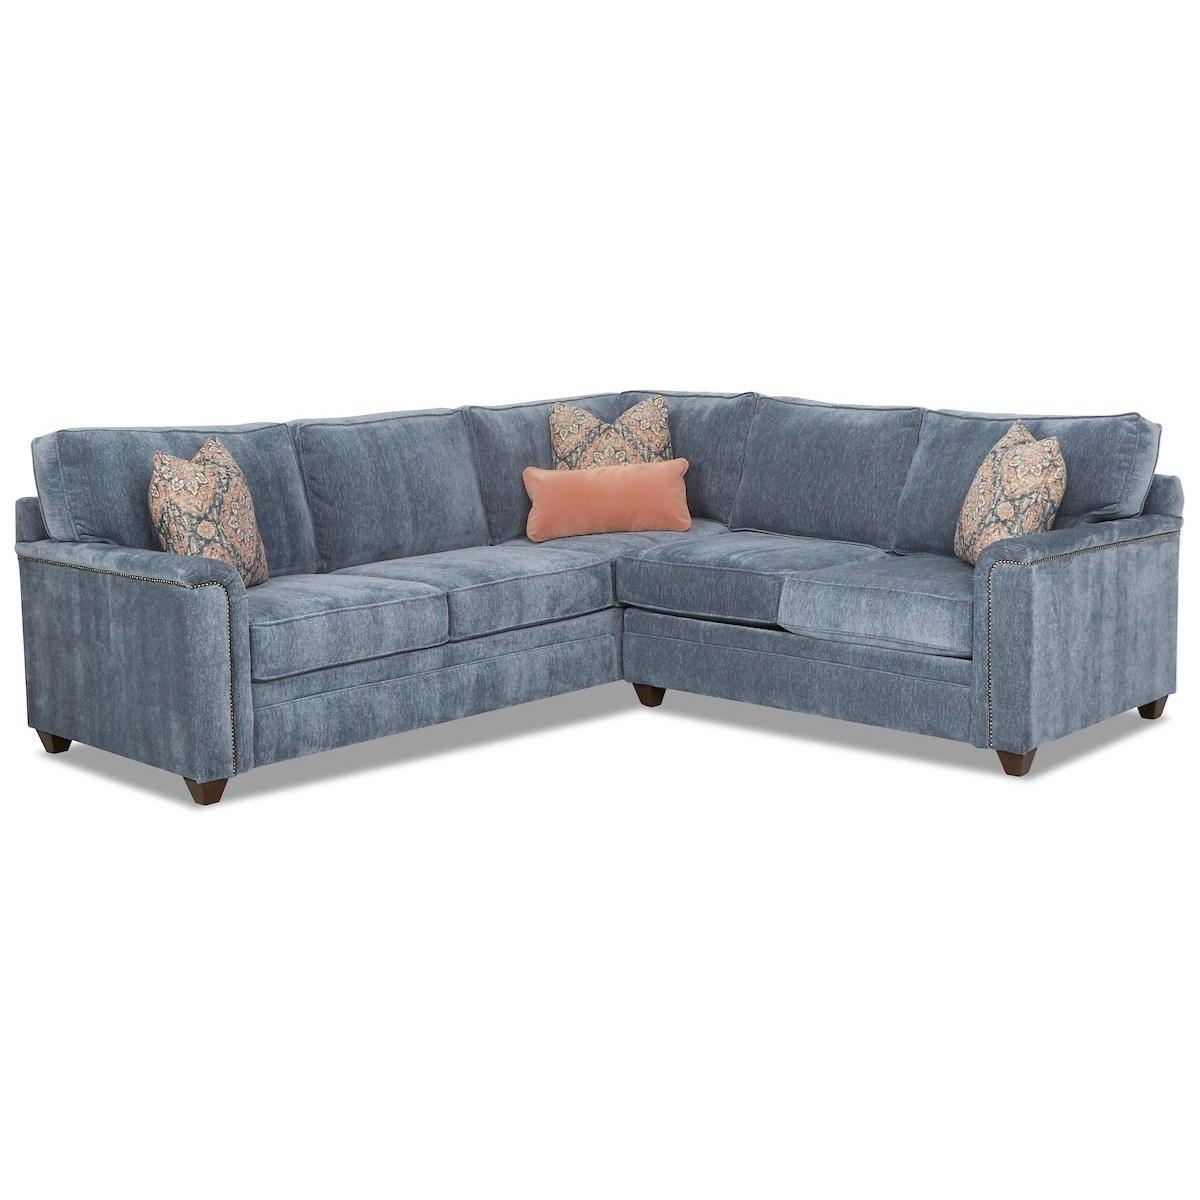 4-Seat Sectional Sofa w/ LAF Corner Sofa